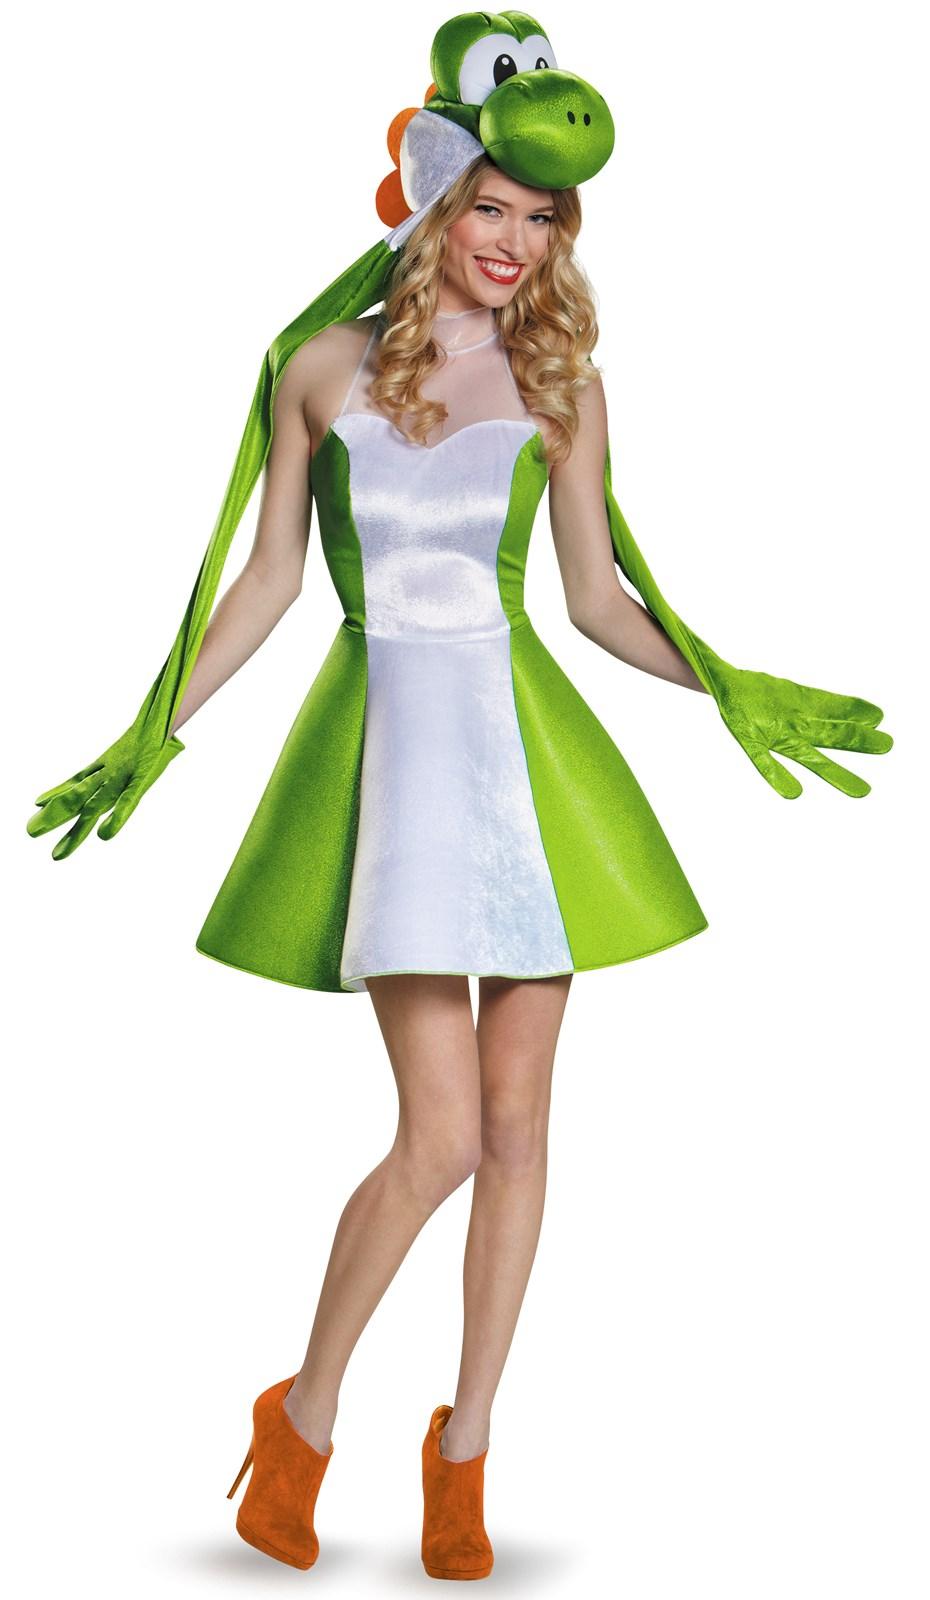 Super Mario Bros: Girls Yoshi Costume For Tweens   BuyCostumes.com